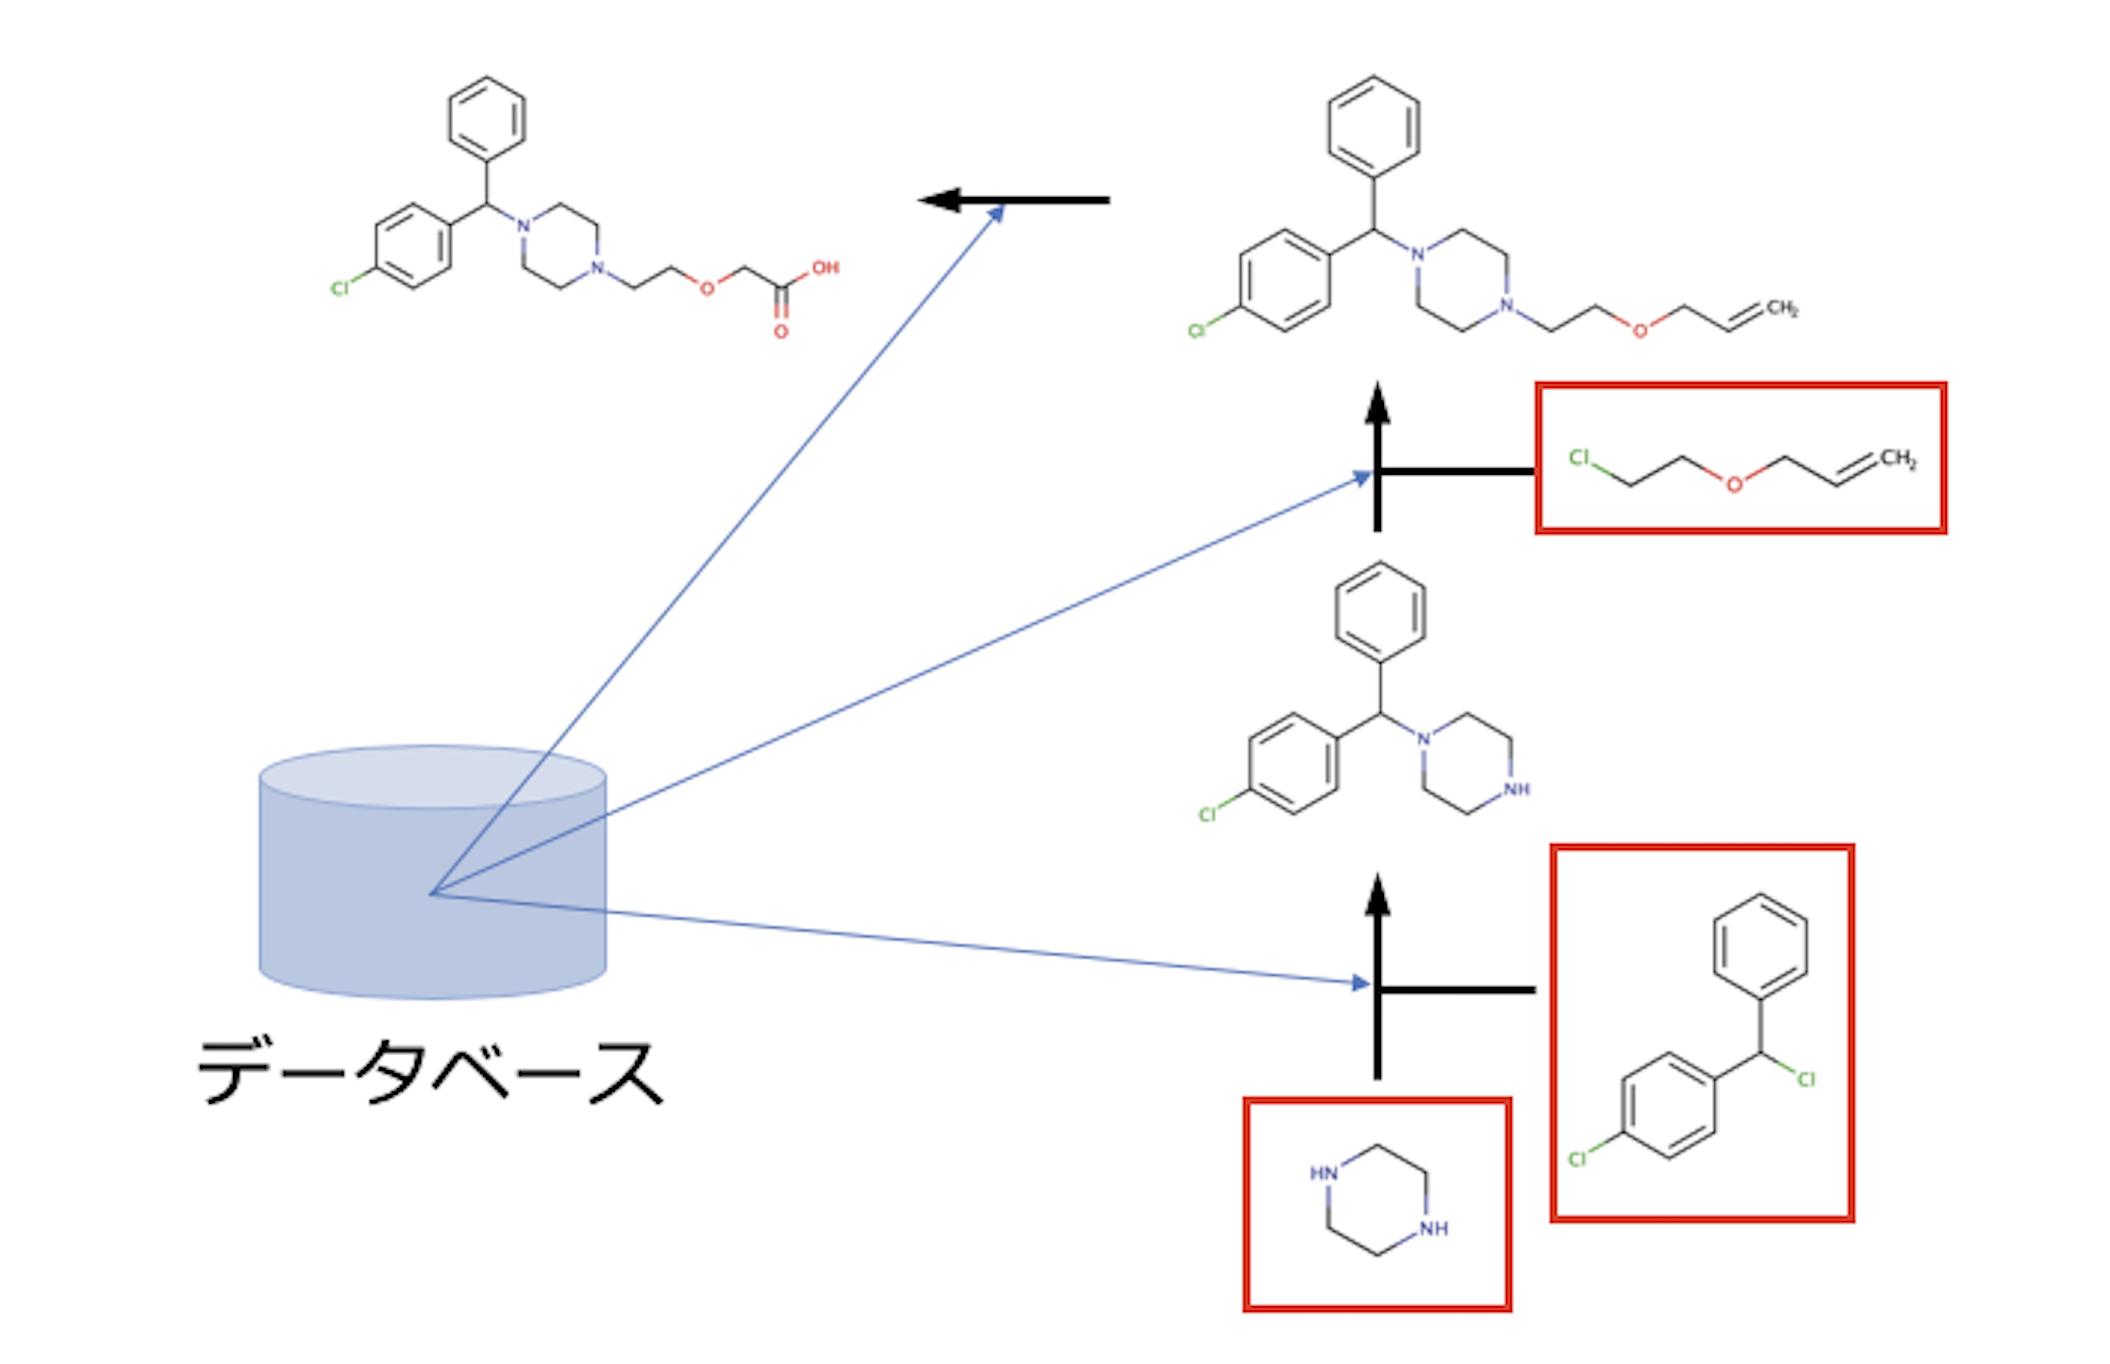 逆合成解析 (Retrosynthesis)の概念図